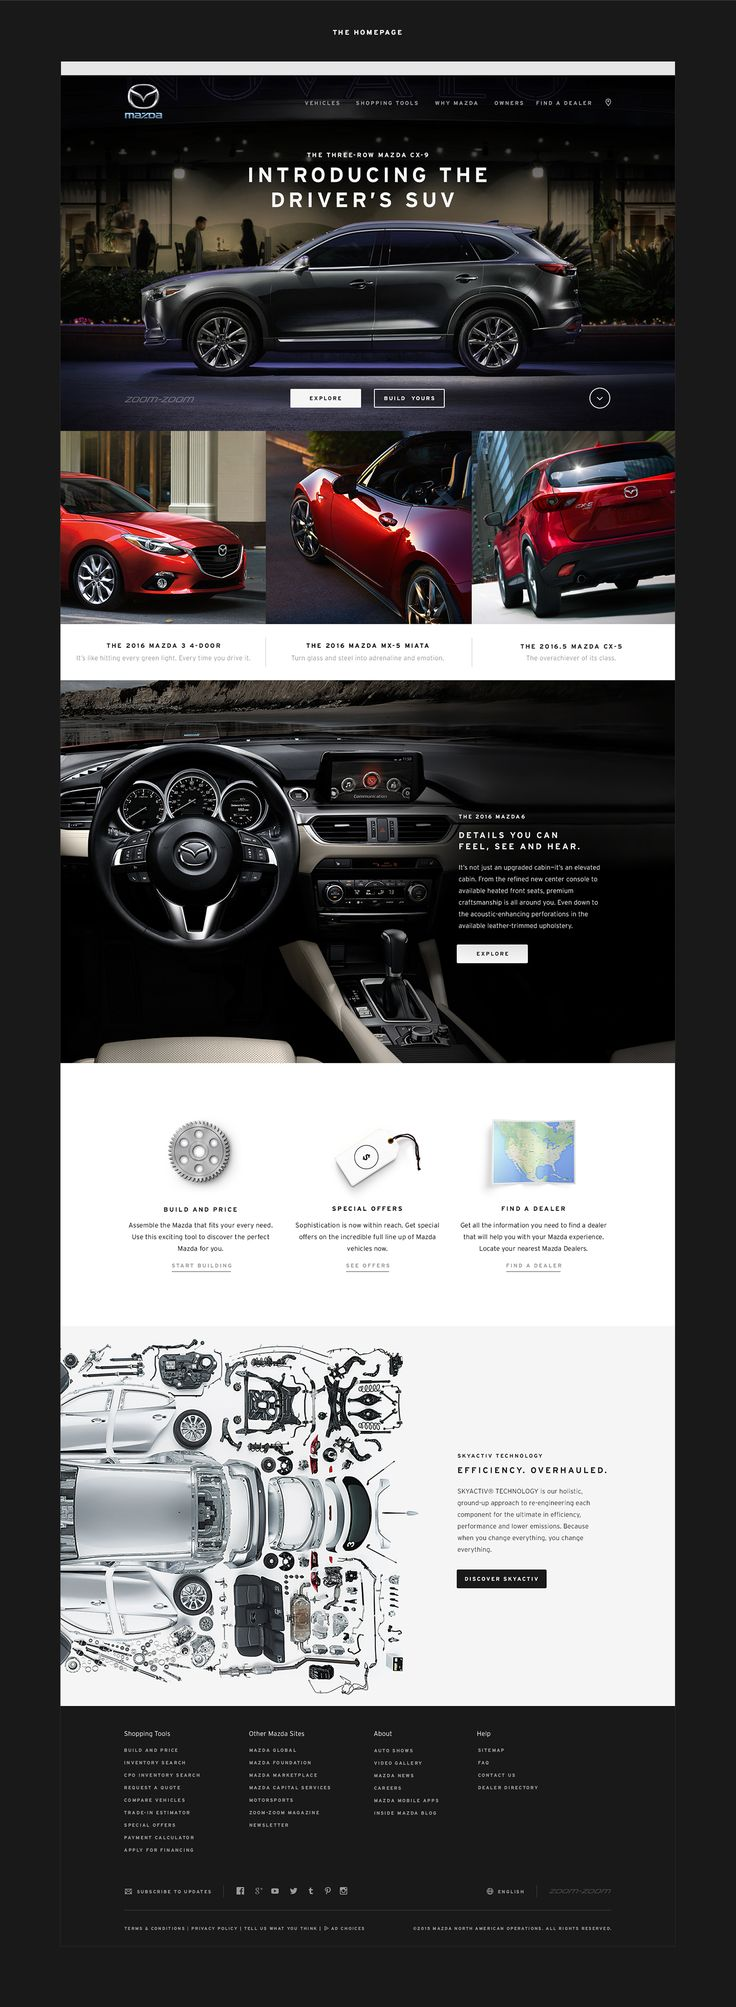 UI Design for the new Mazda website